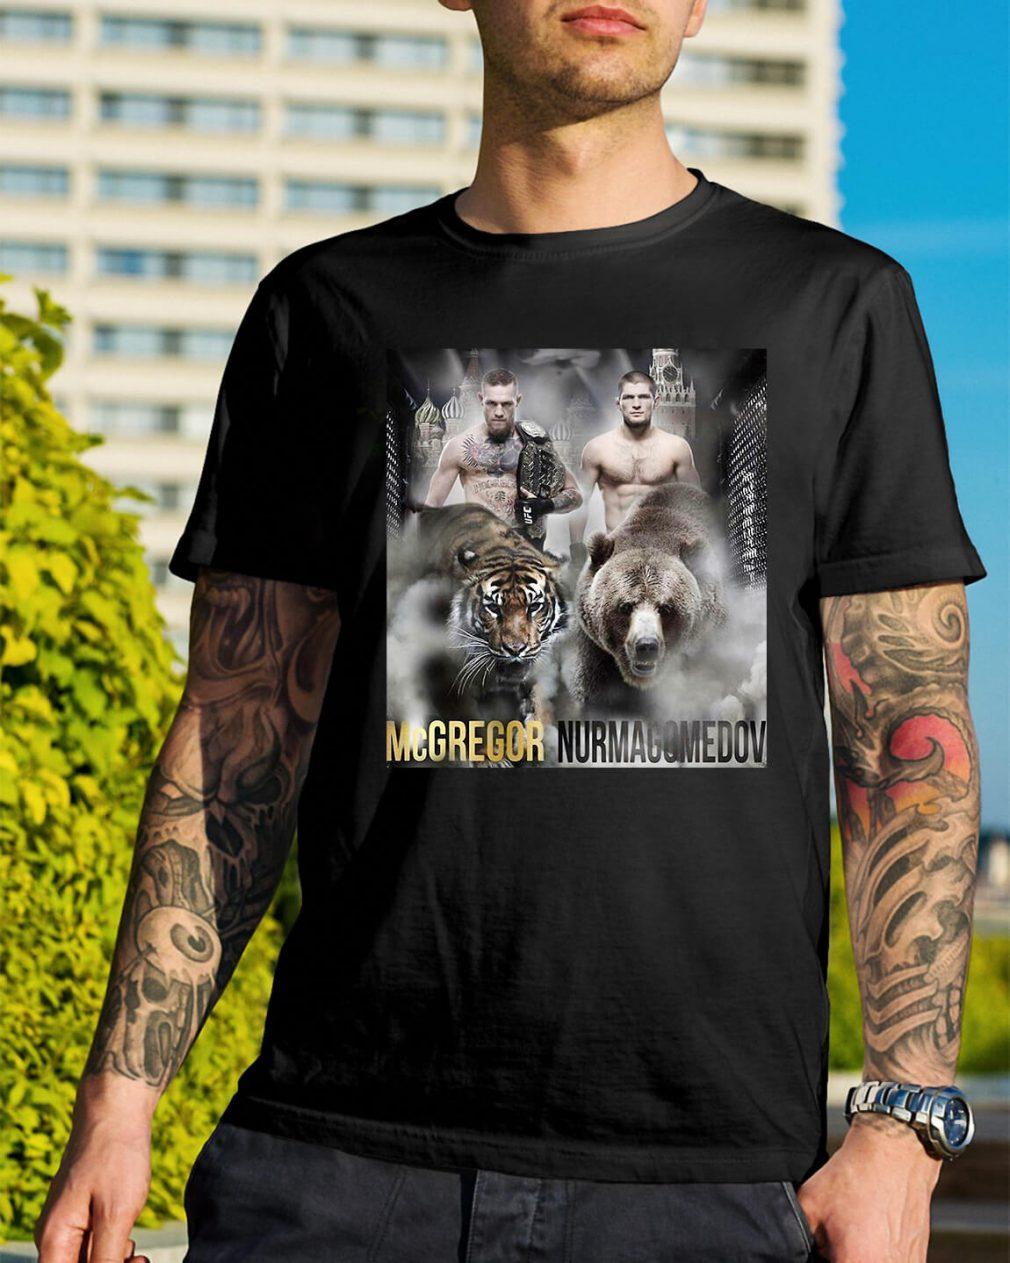 Conor Mcgregor vs Khabib Nurmagomedov shirt